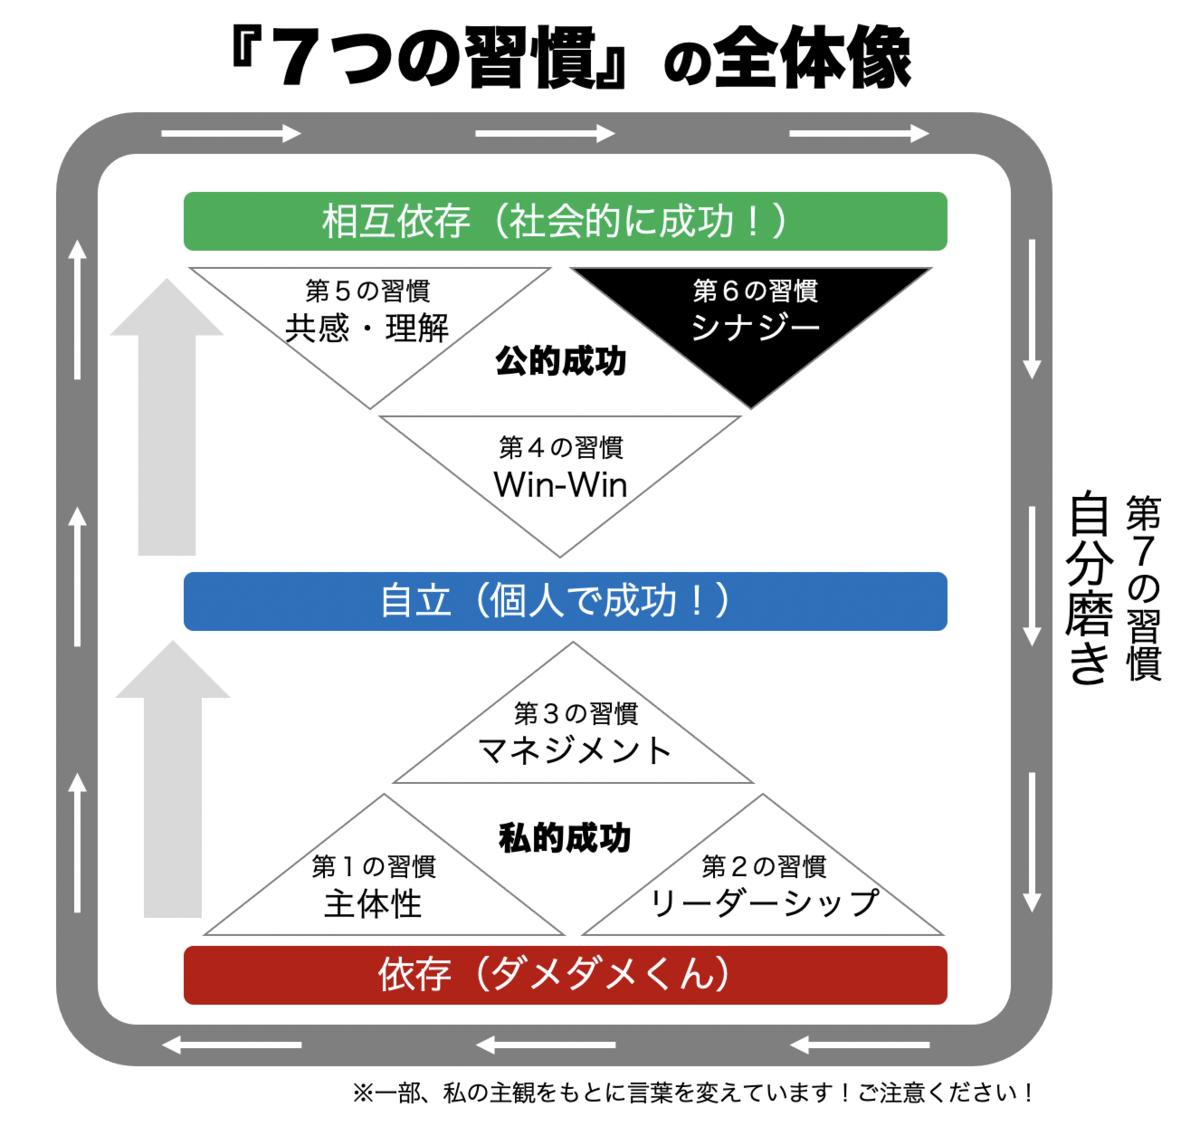 f:id:presen-sen-nin:20200831164831p:plain